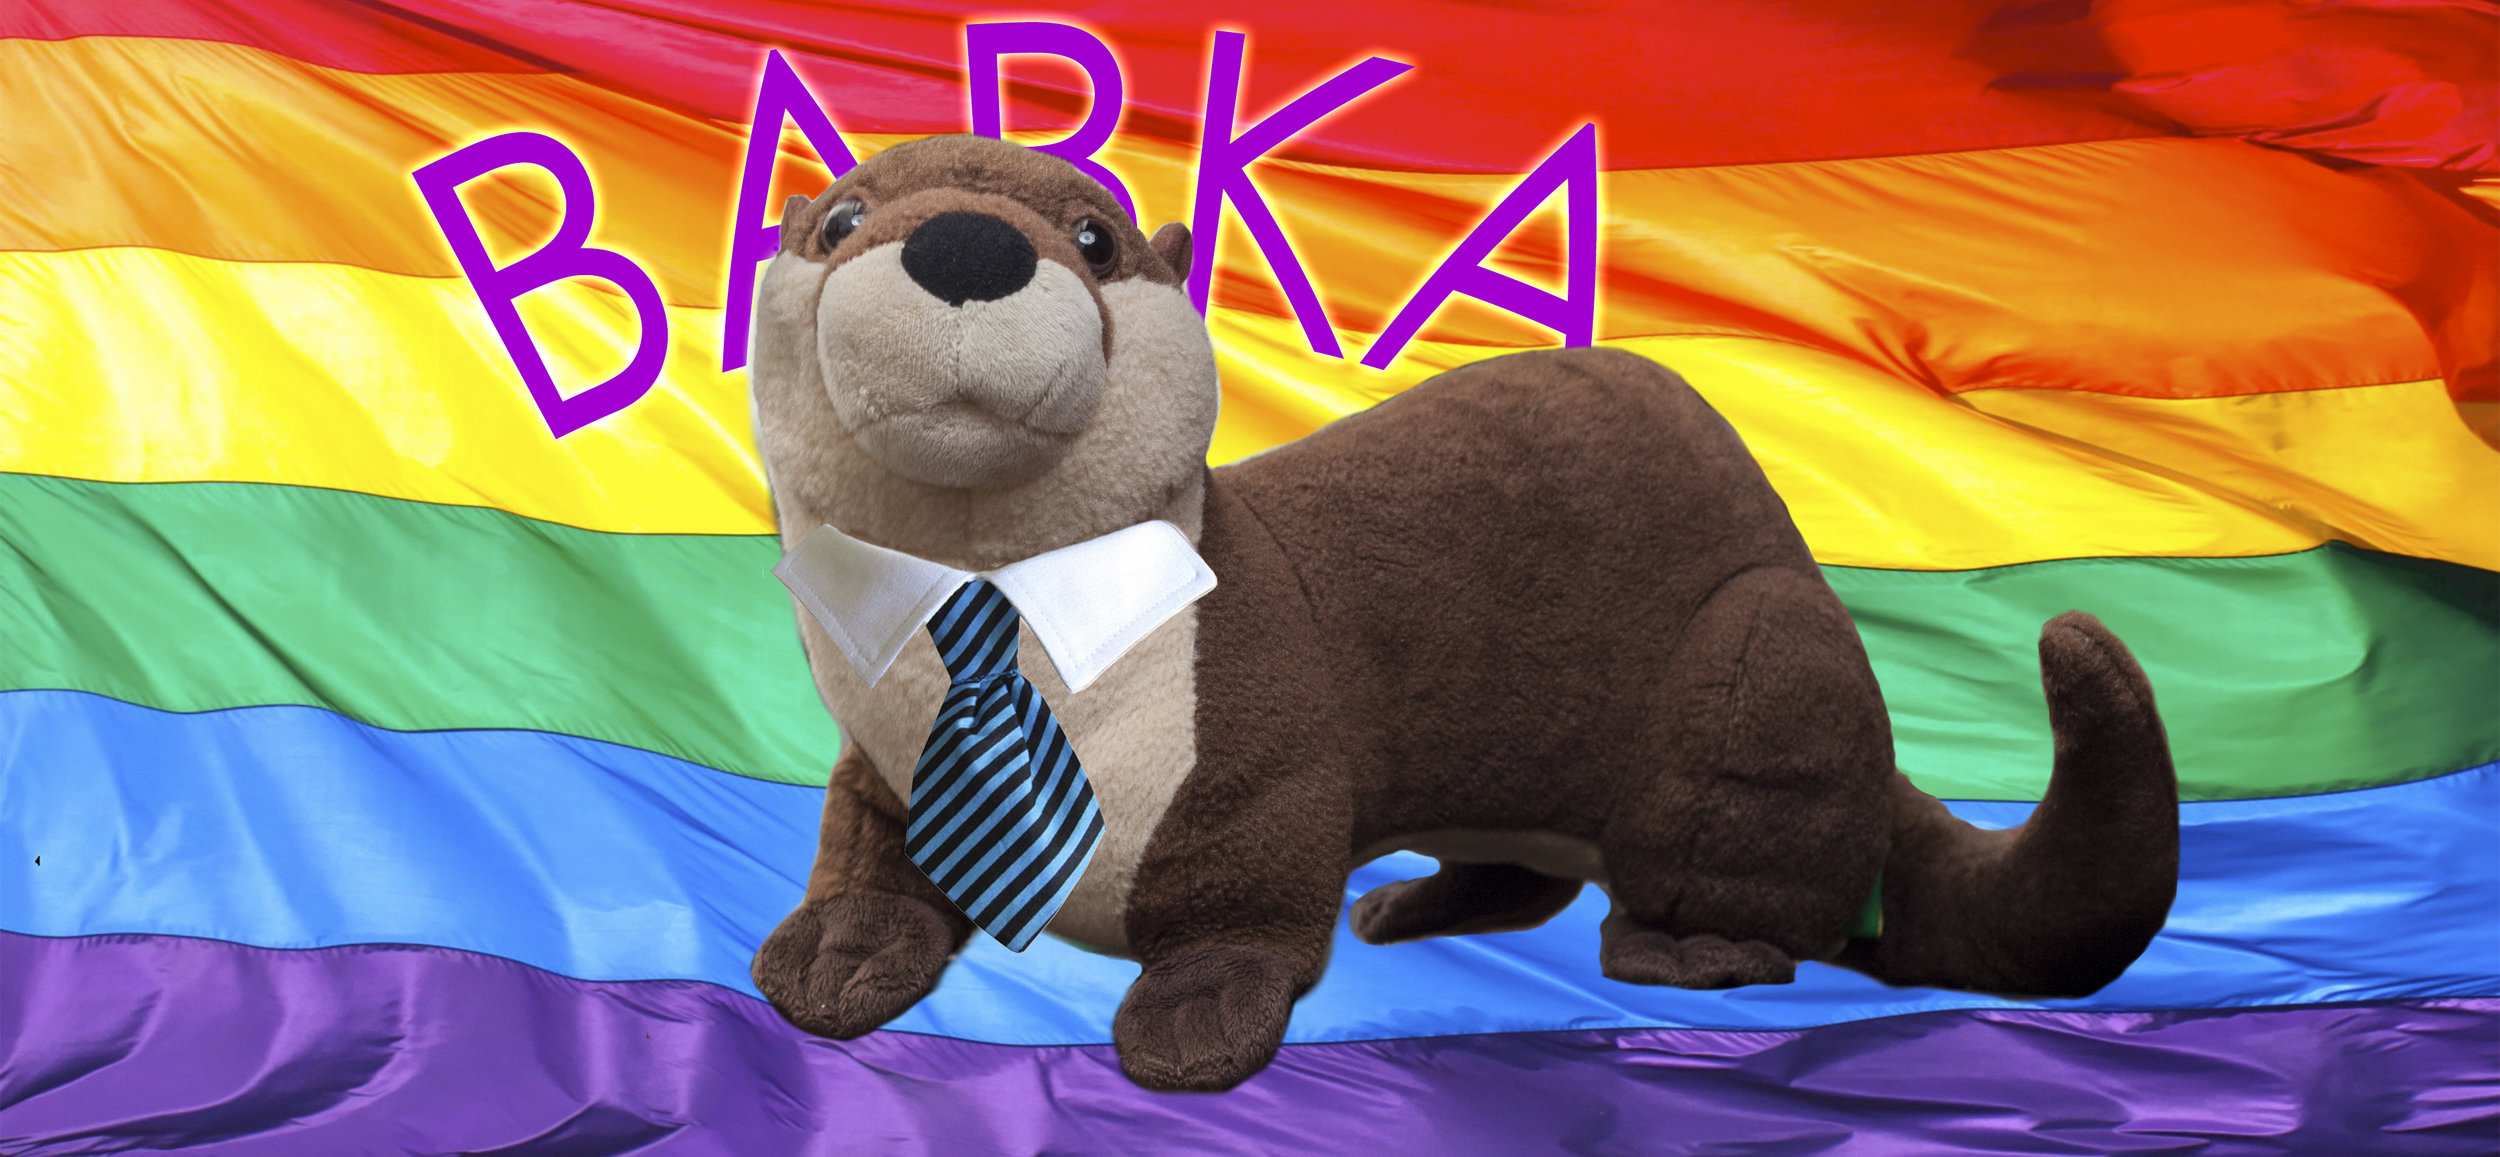 Babka the Otter looking presidential. Little tie by bowwowsbest.Rainbow flag by  Torkbakhopper .